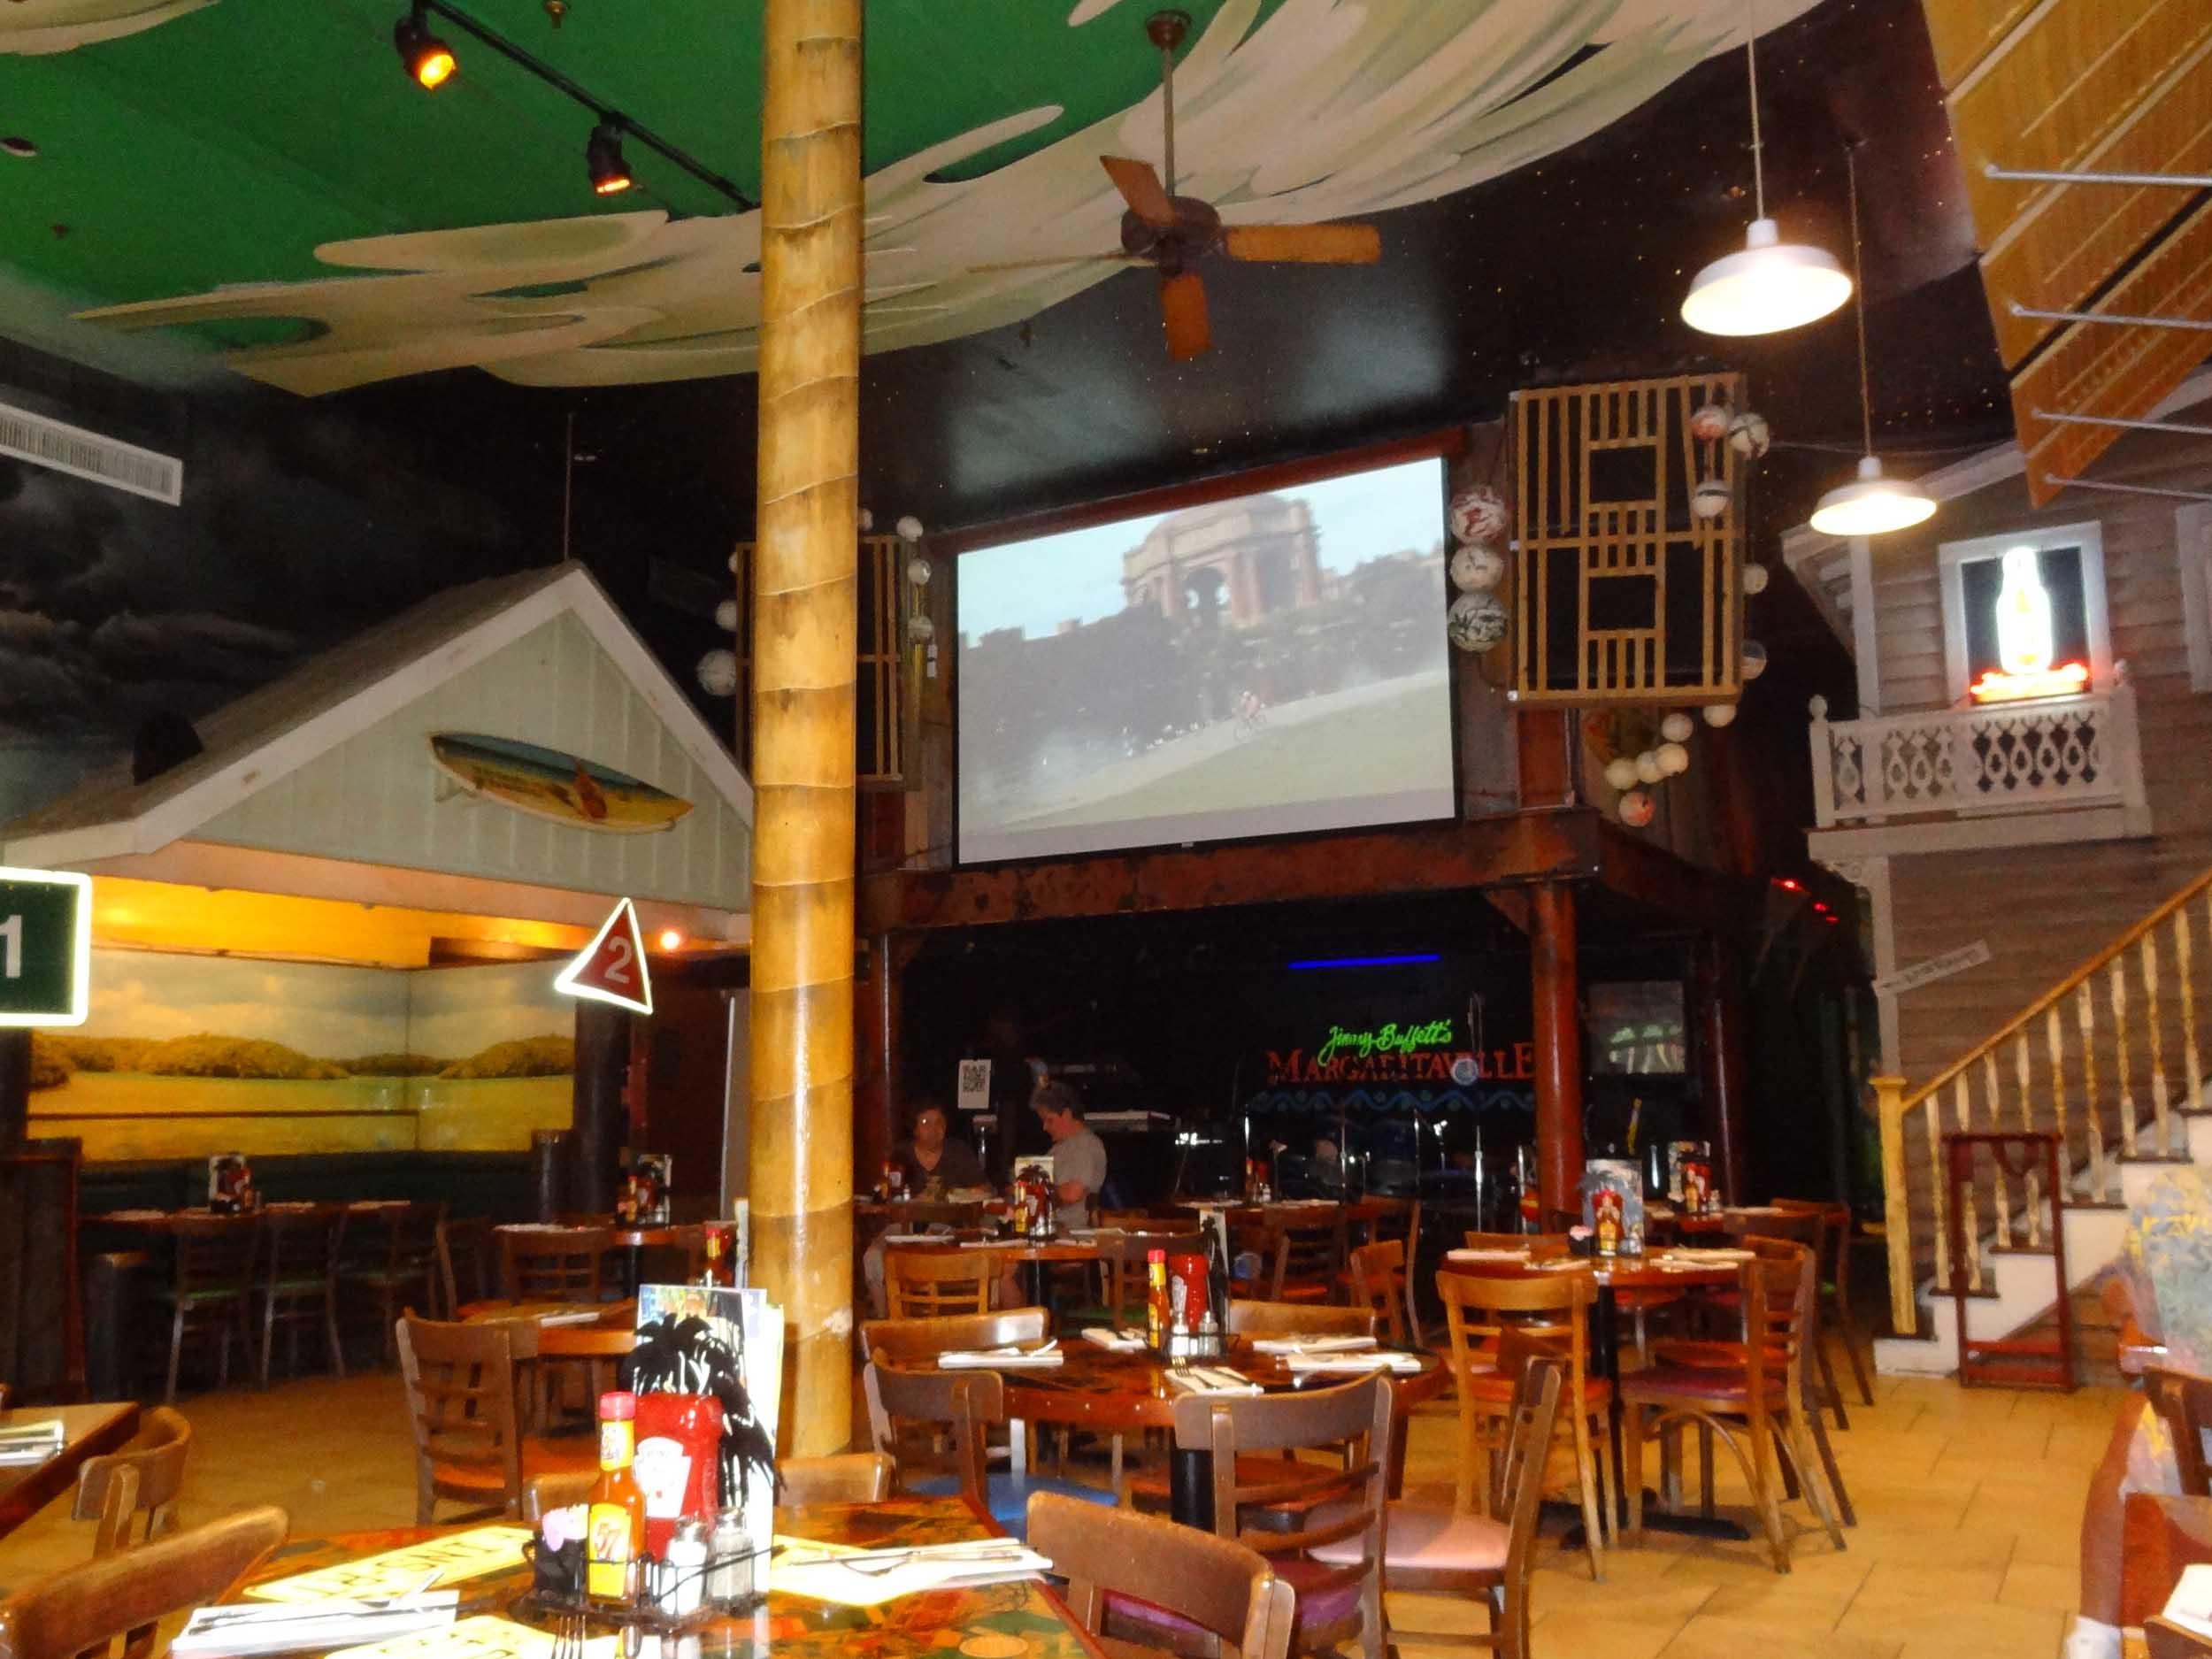 Jimmy Buffett's Margaritaville Cafe Interior